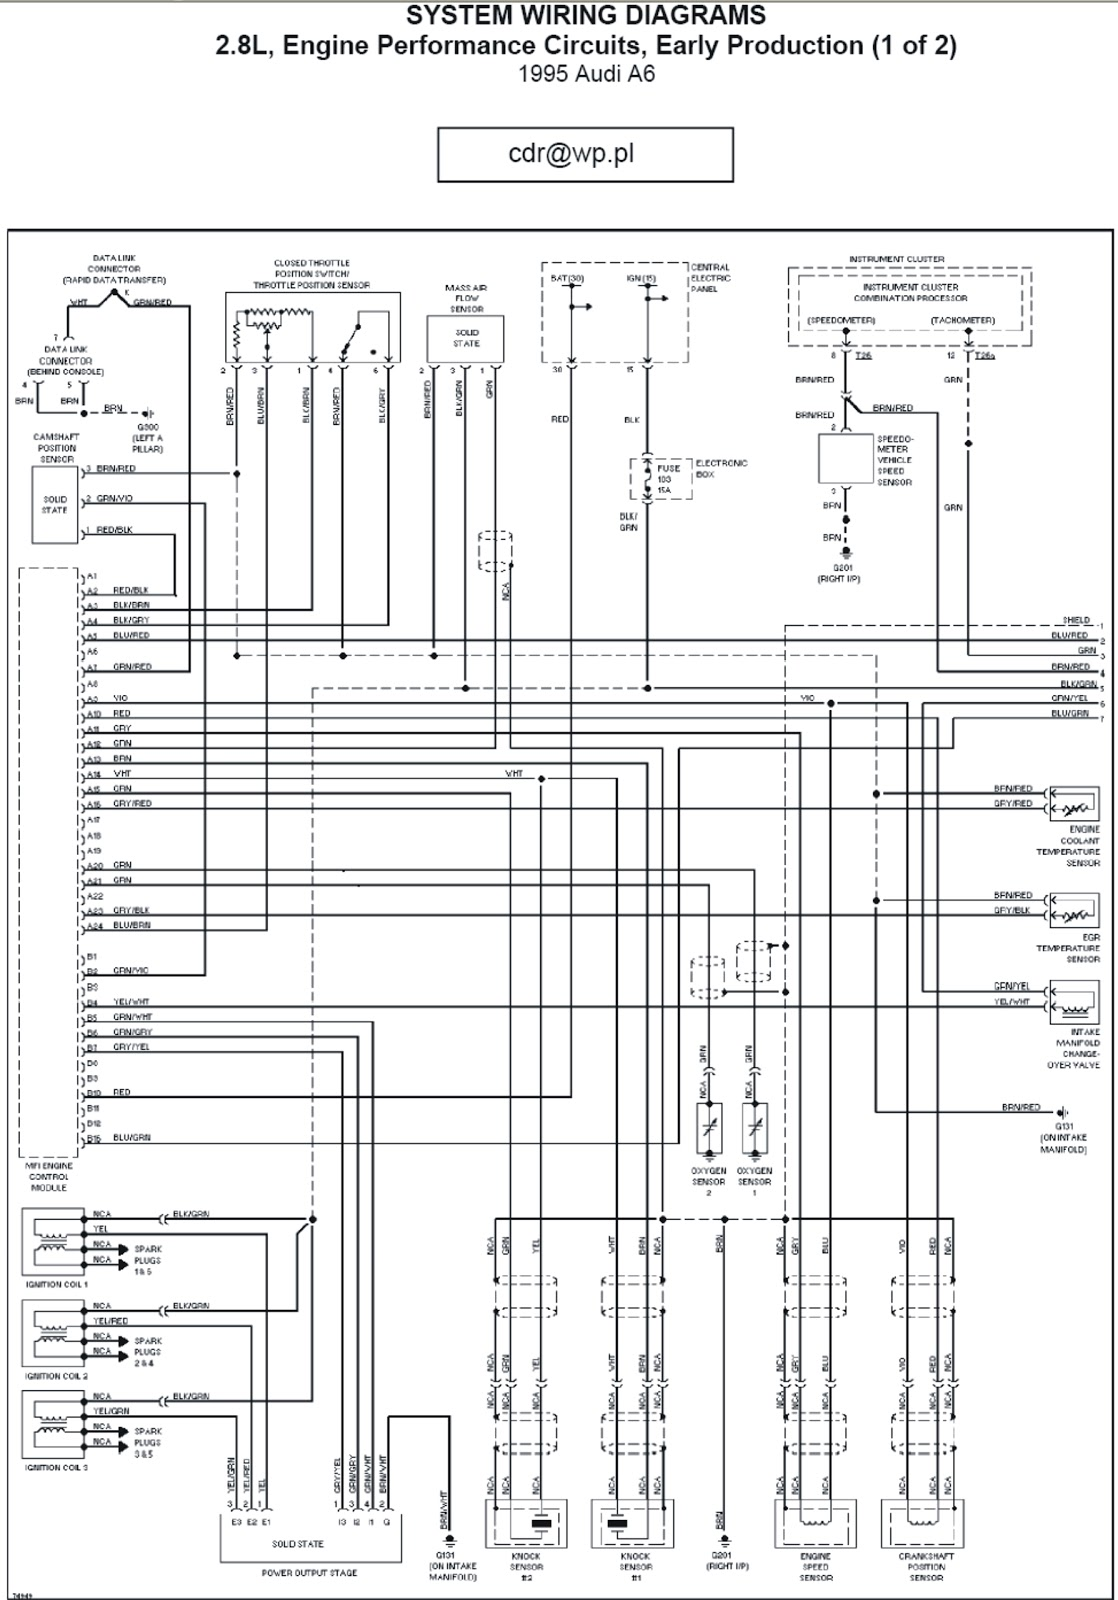 Manualguide 1990 Buick Riviera Engine Diagram Wiring 1996 Library Rh 83 Dirtytalk Camgirls De